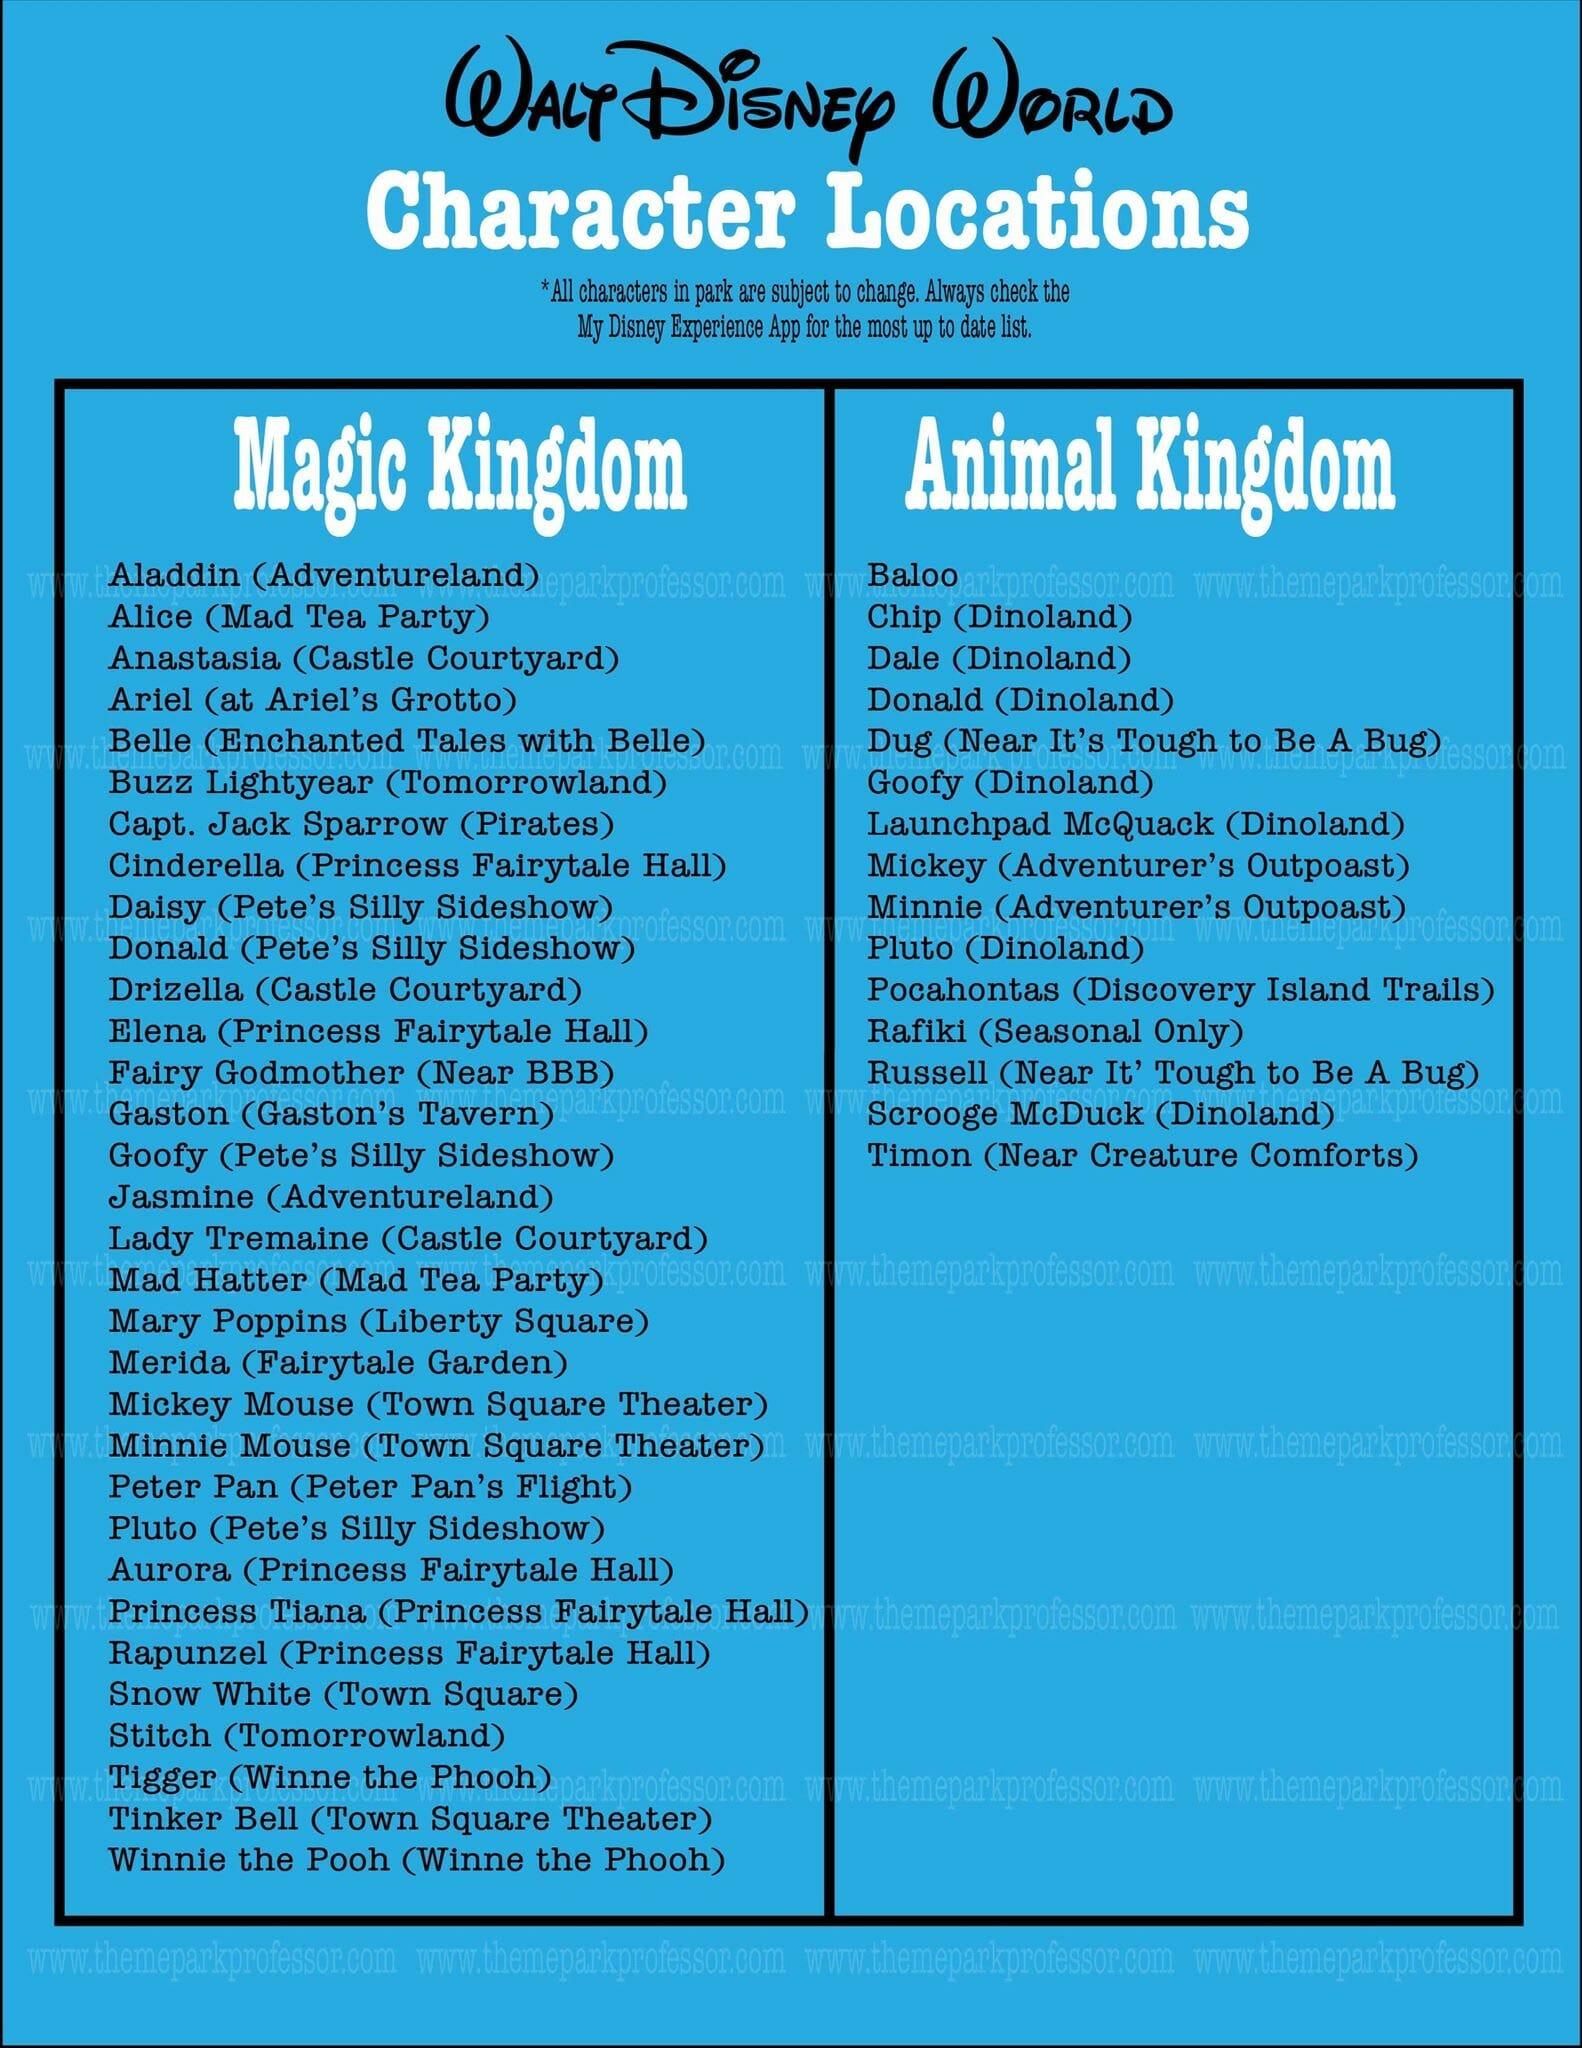 Walt Disney World Printable Character Guide